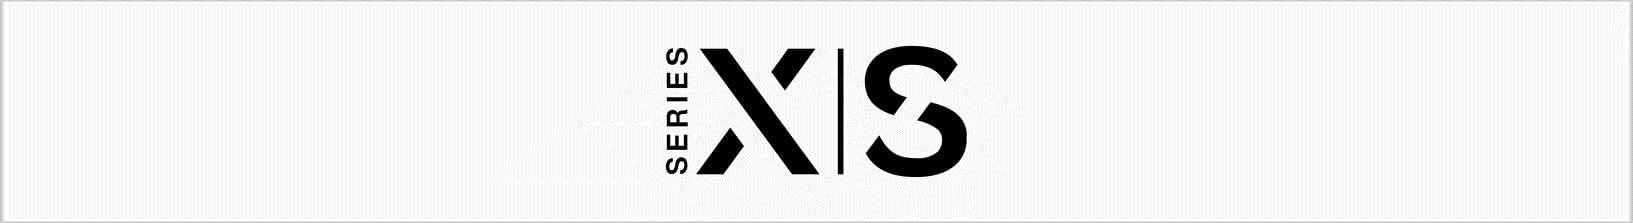 Series X